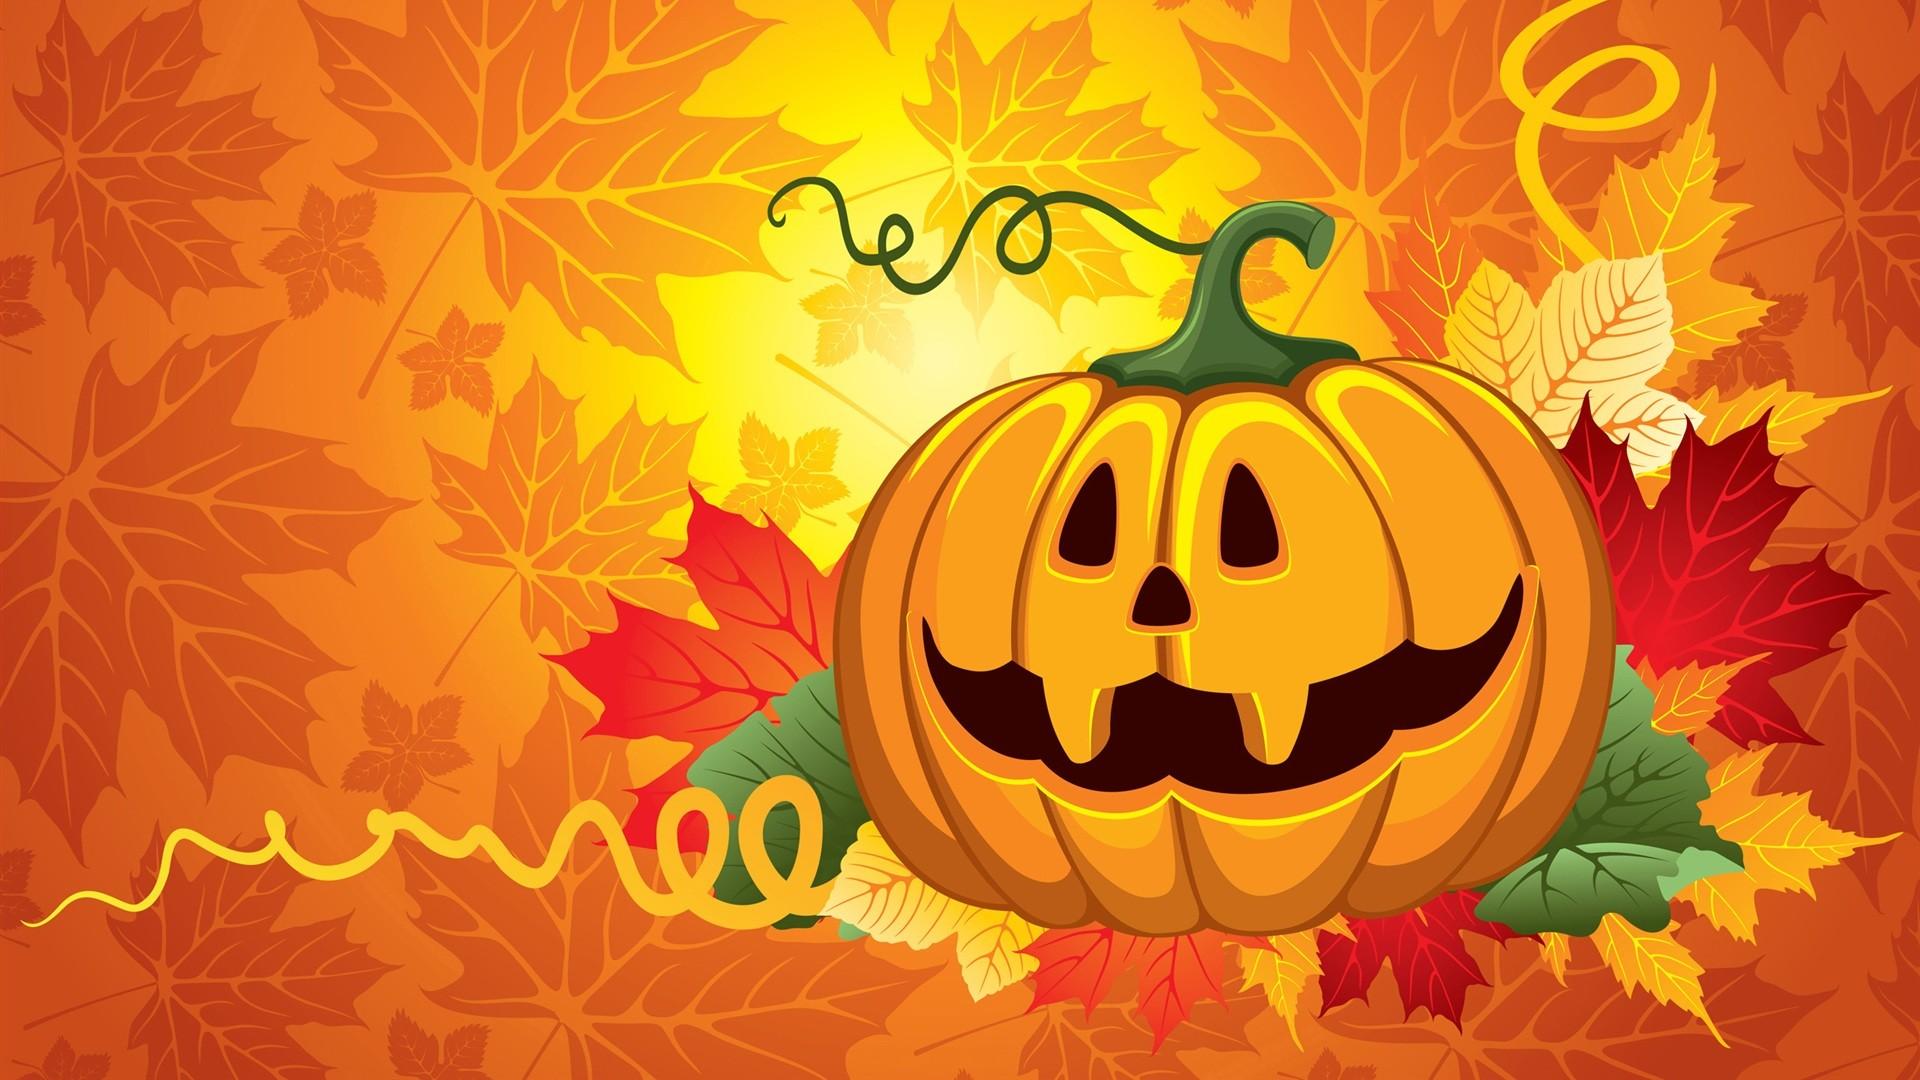 Cute Halloween Wallpaper for Desktop (66+ images)